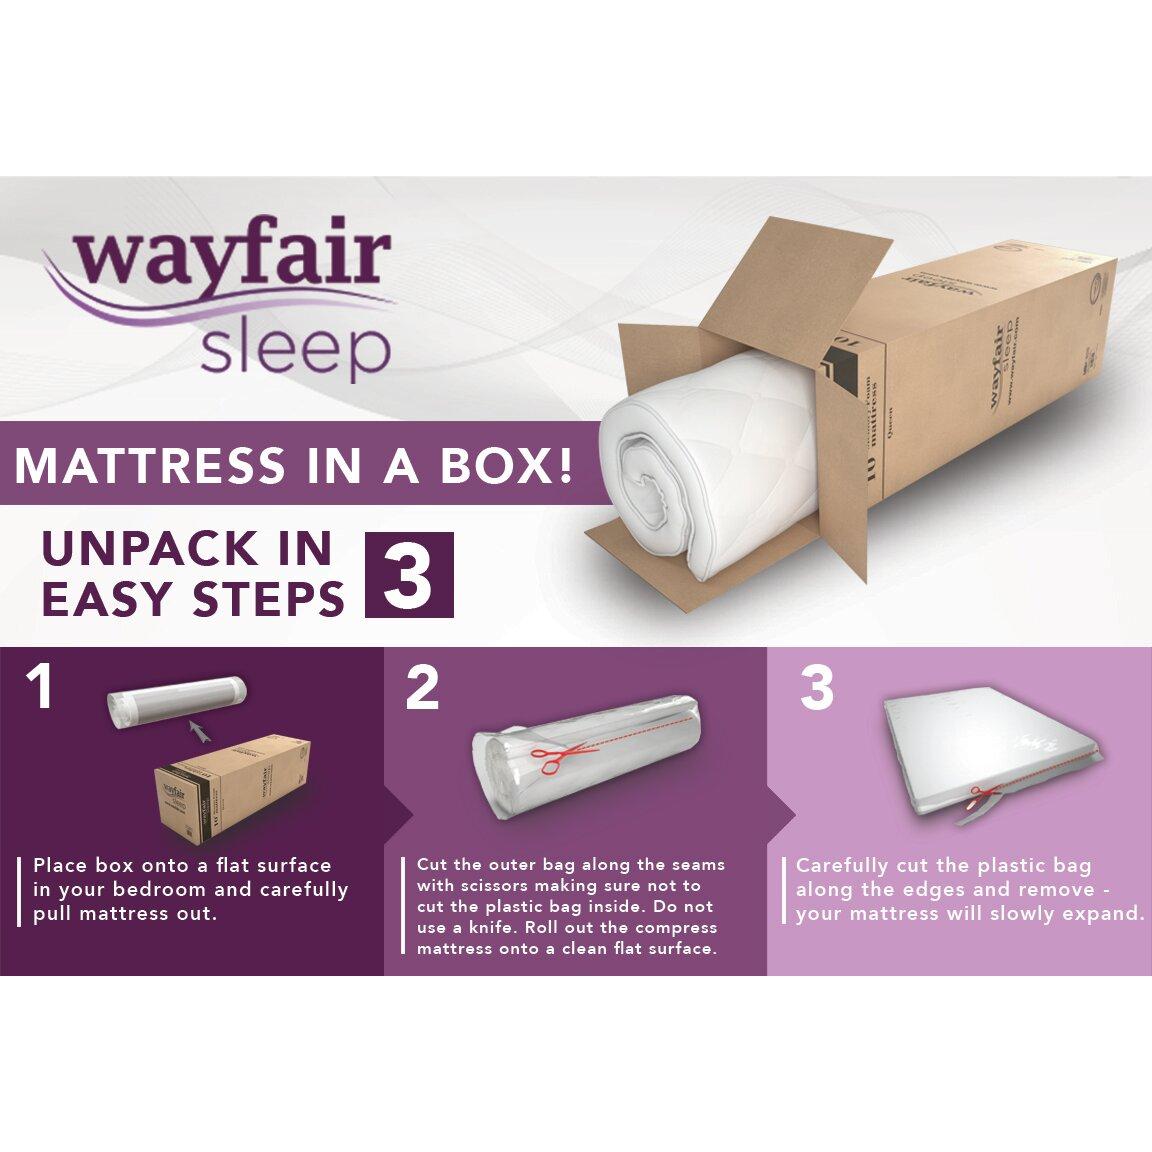 Wayfair 10 off first order - Magnifying Glass